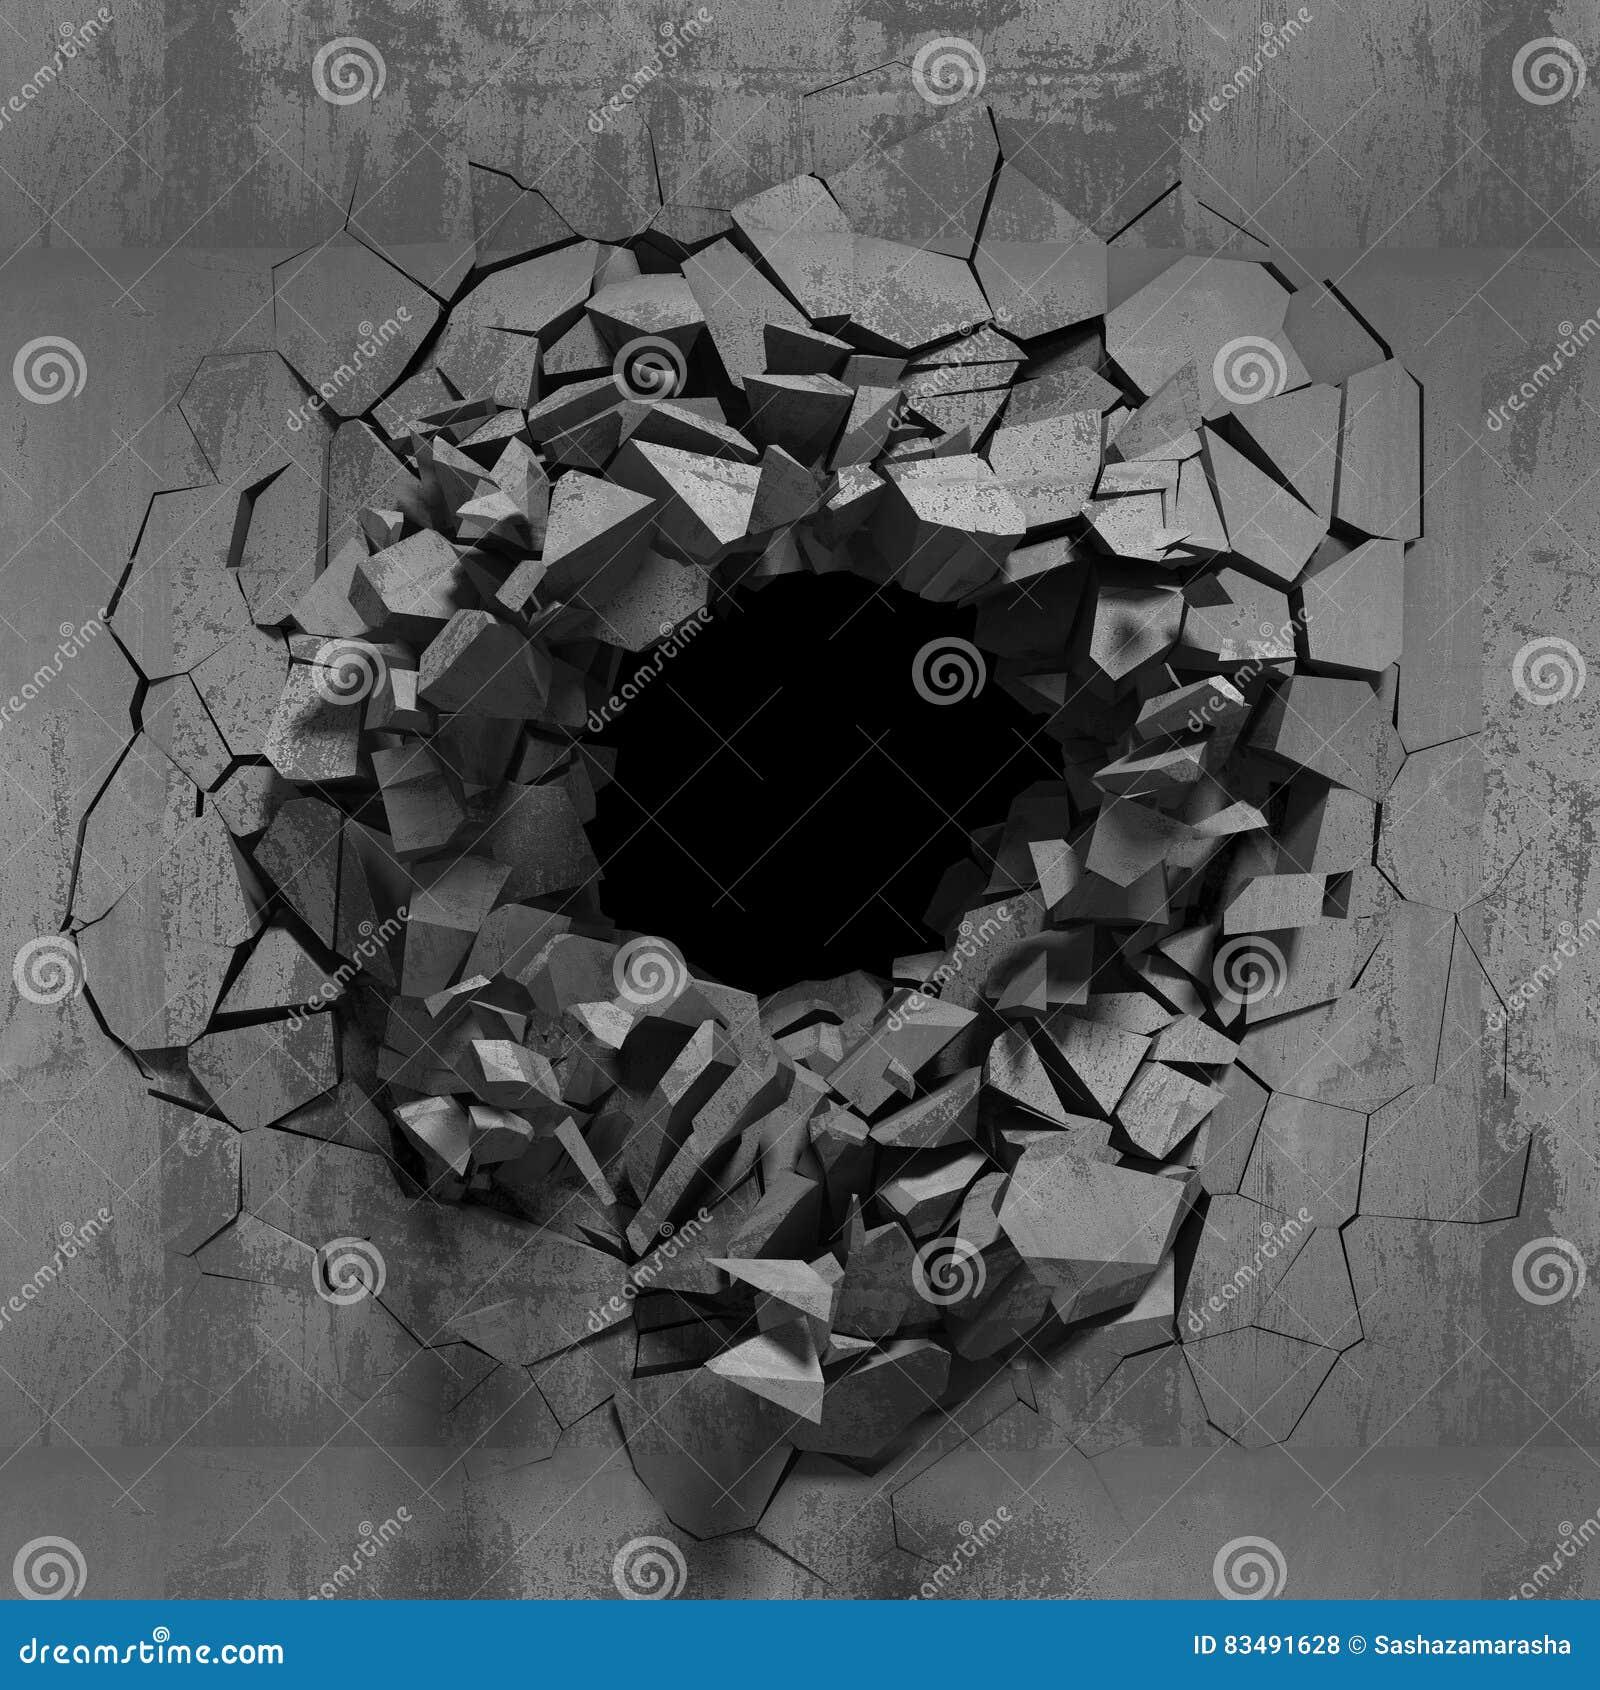 Royalty Free Stock Photo  Download Dark Cracked Broken Wall In Concrete. Dark Cracked Broken Wall In Concrete Wall  Grunge Background Stock